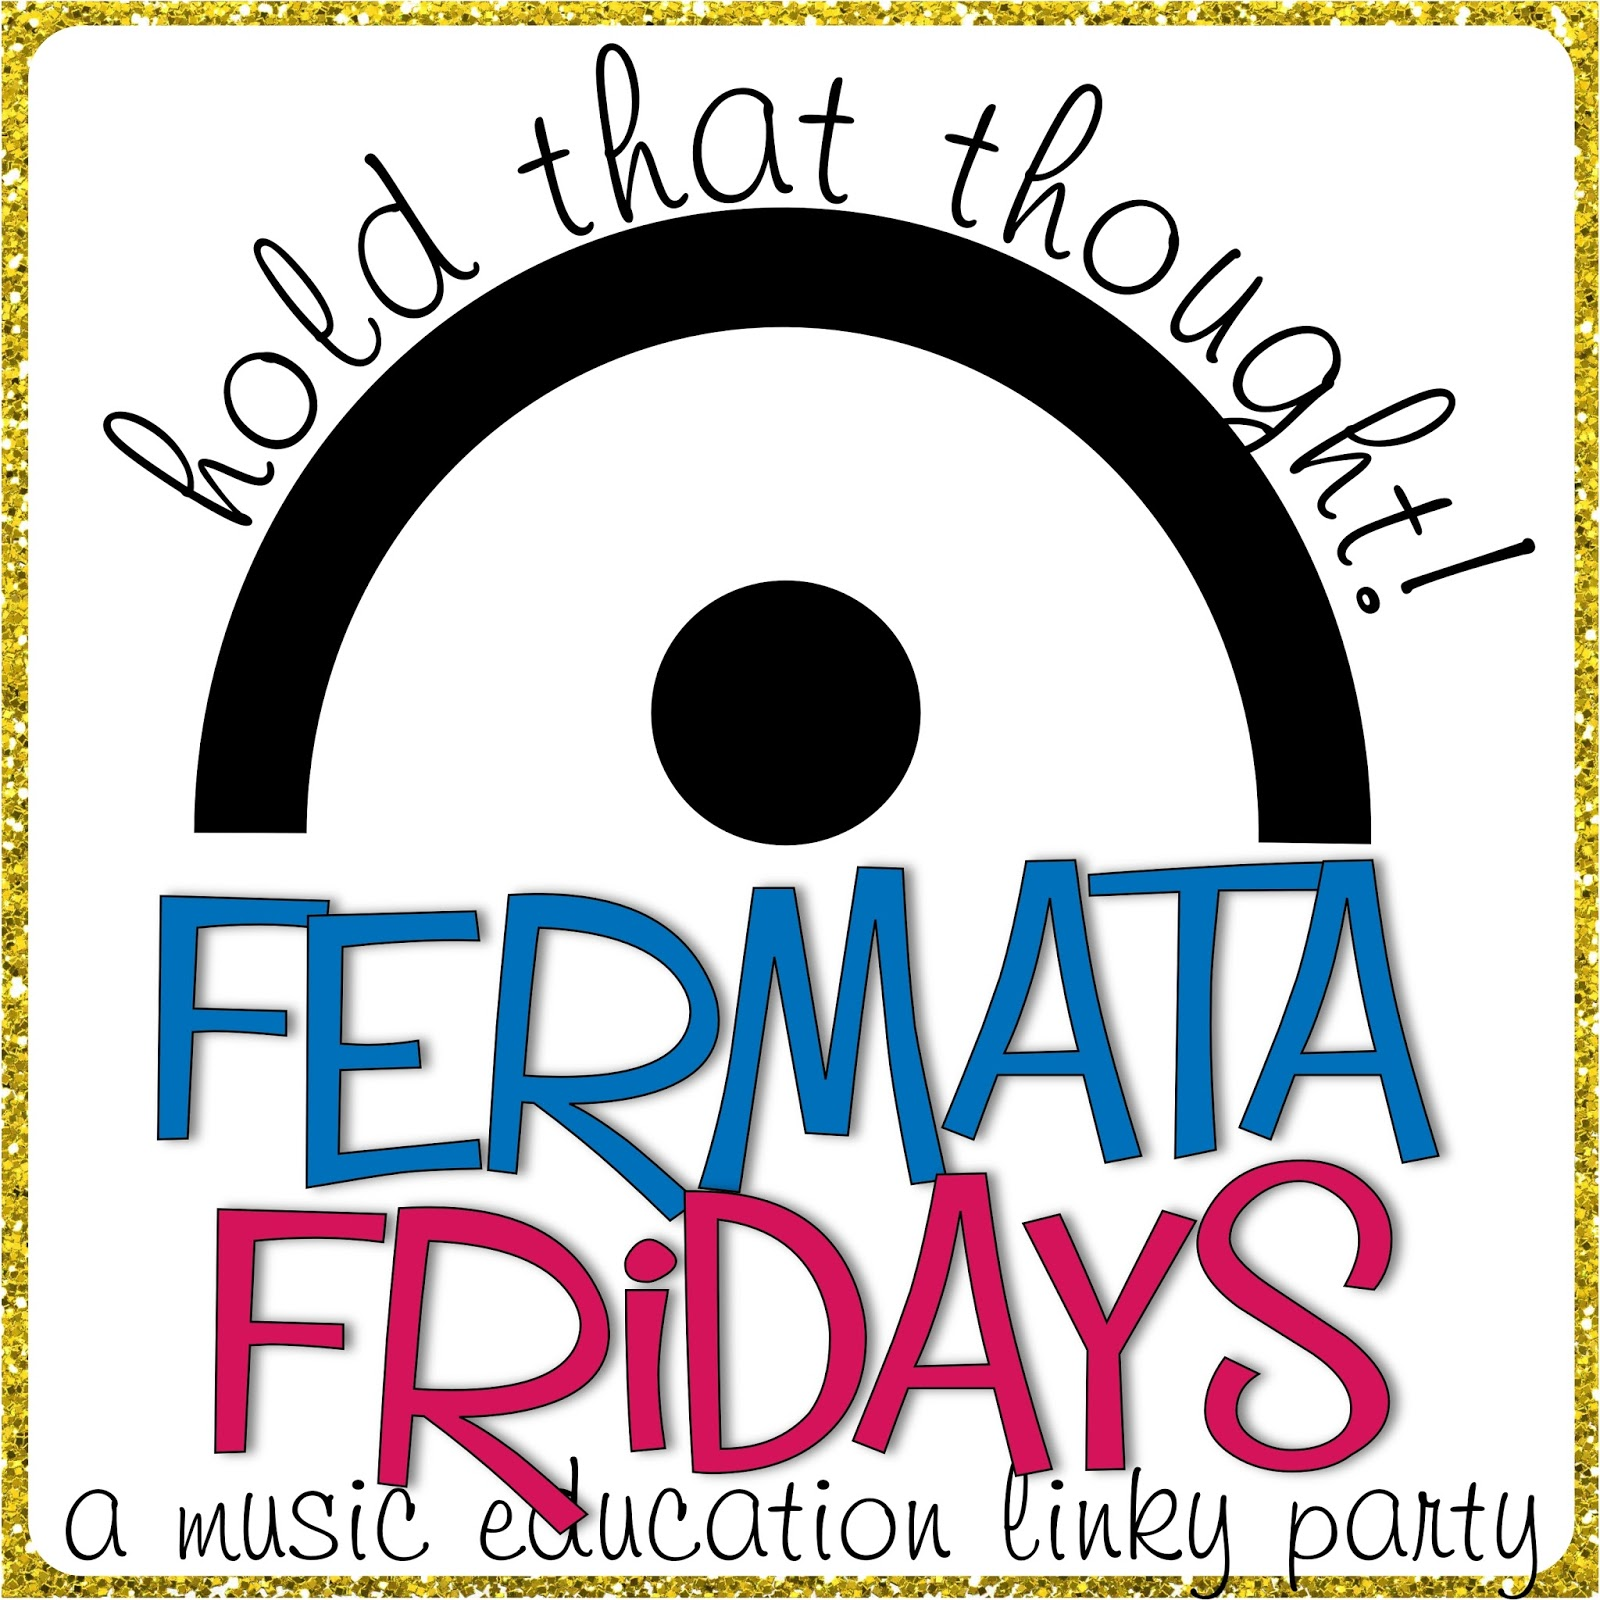 Fermata Fridays August 14 2015